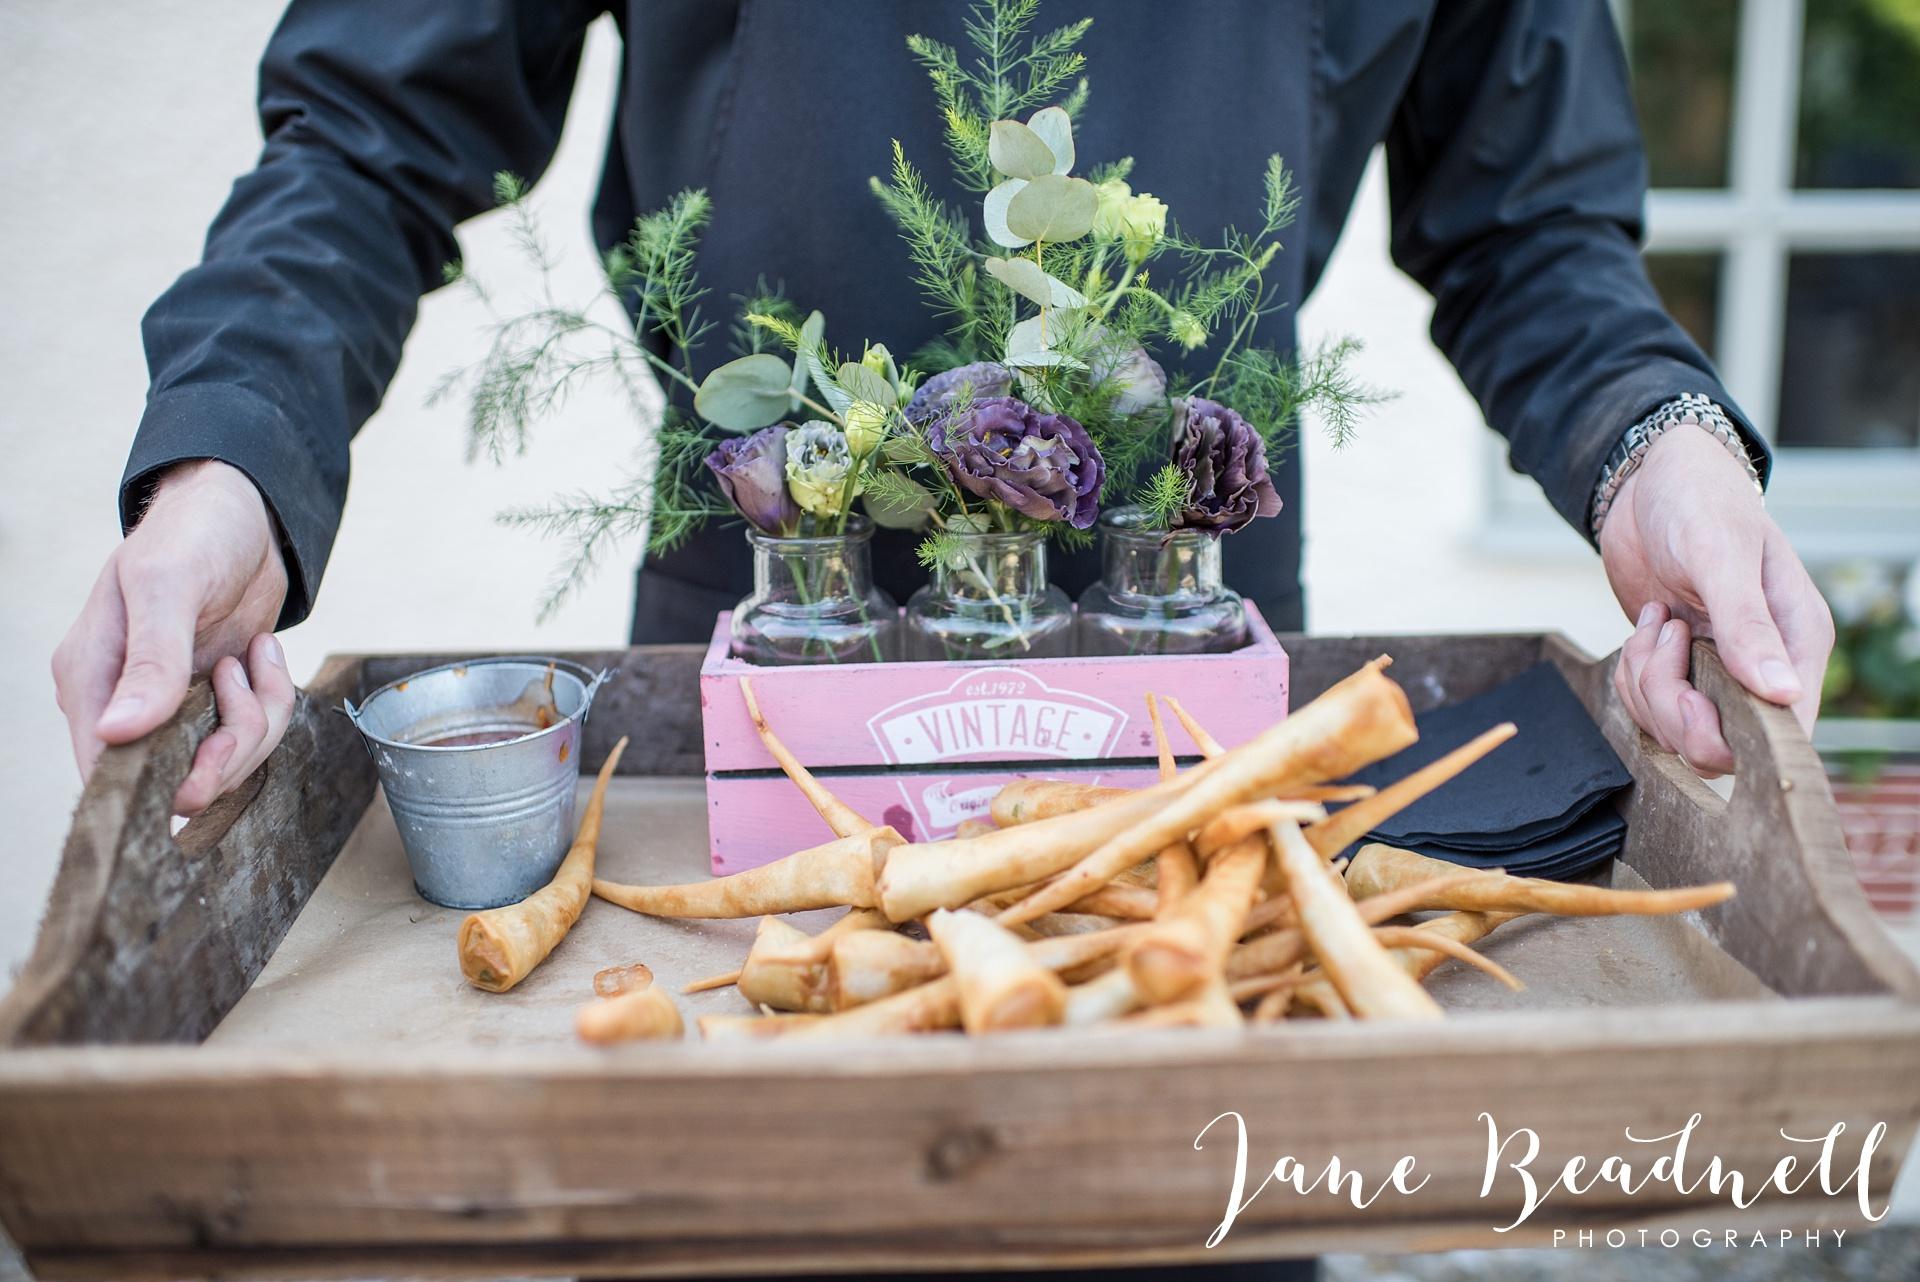 fine-art-wedding-photographer-jane-beadnell-yorkshire-wedding-photographer_0078